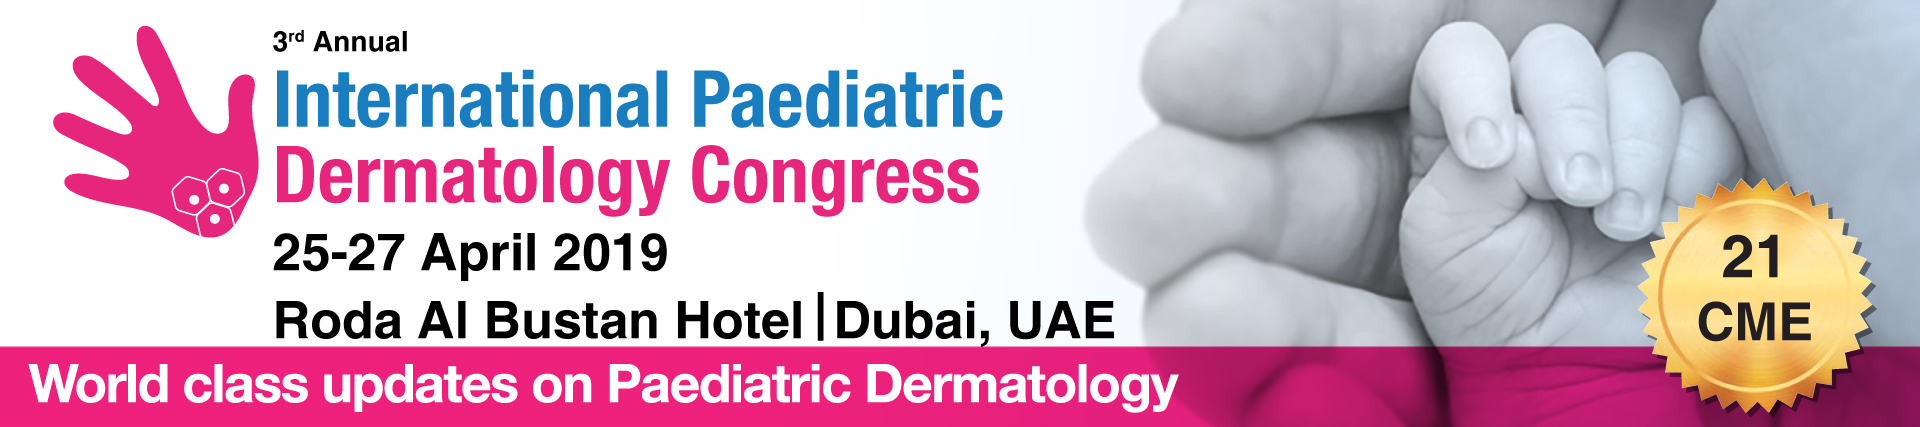 International Paediatric Dermatology Congress